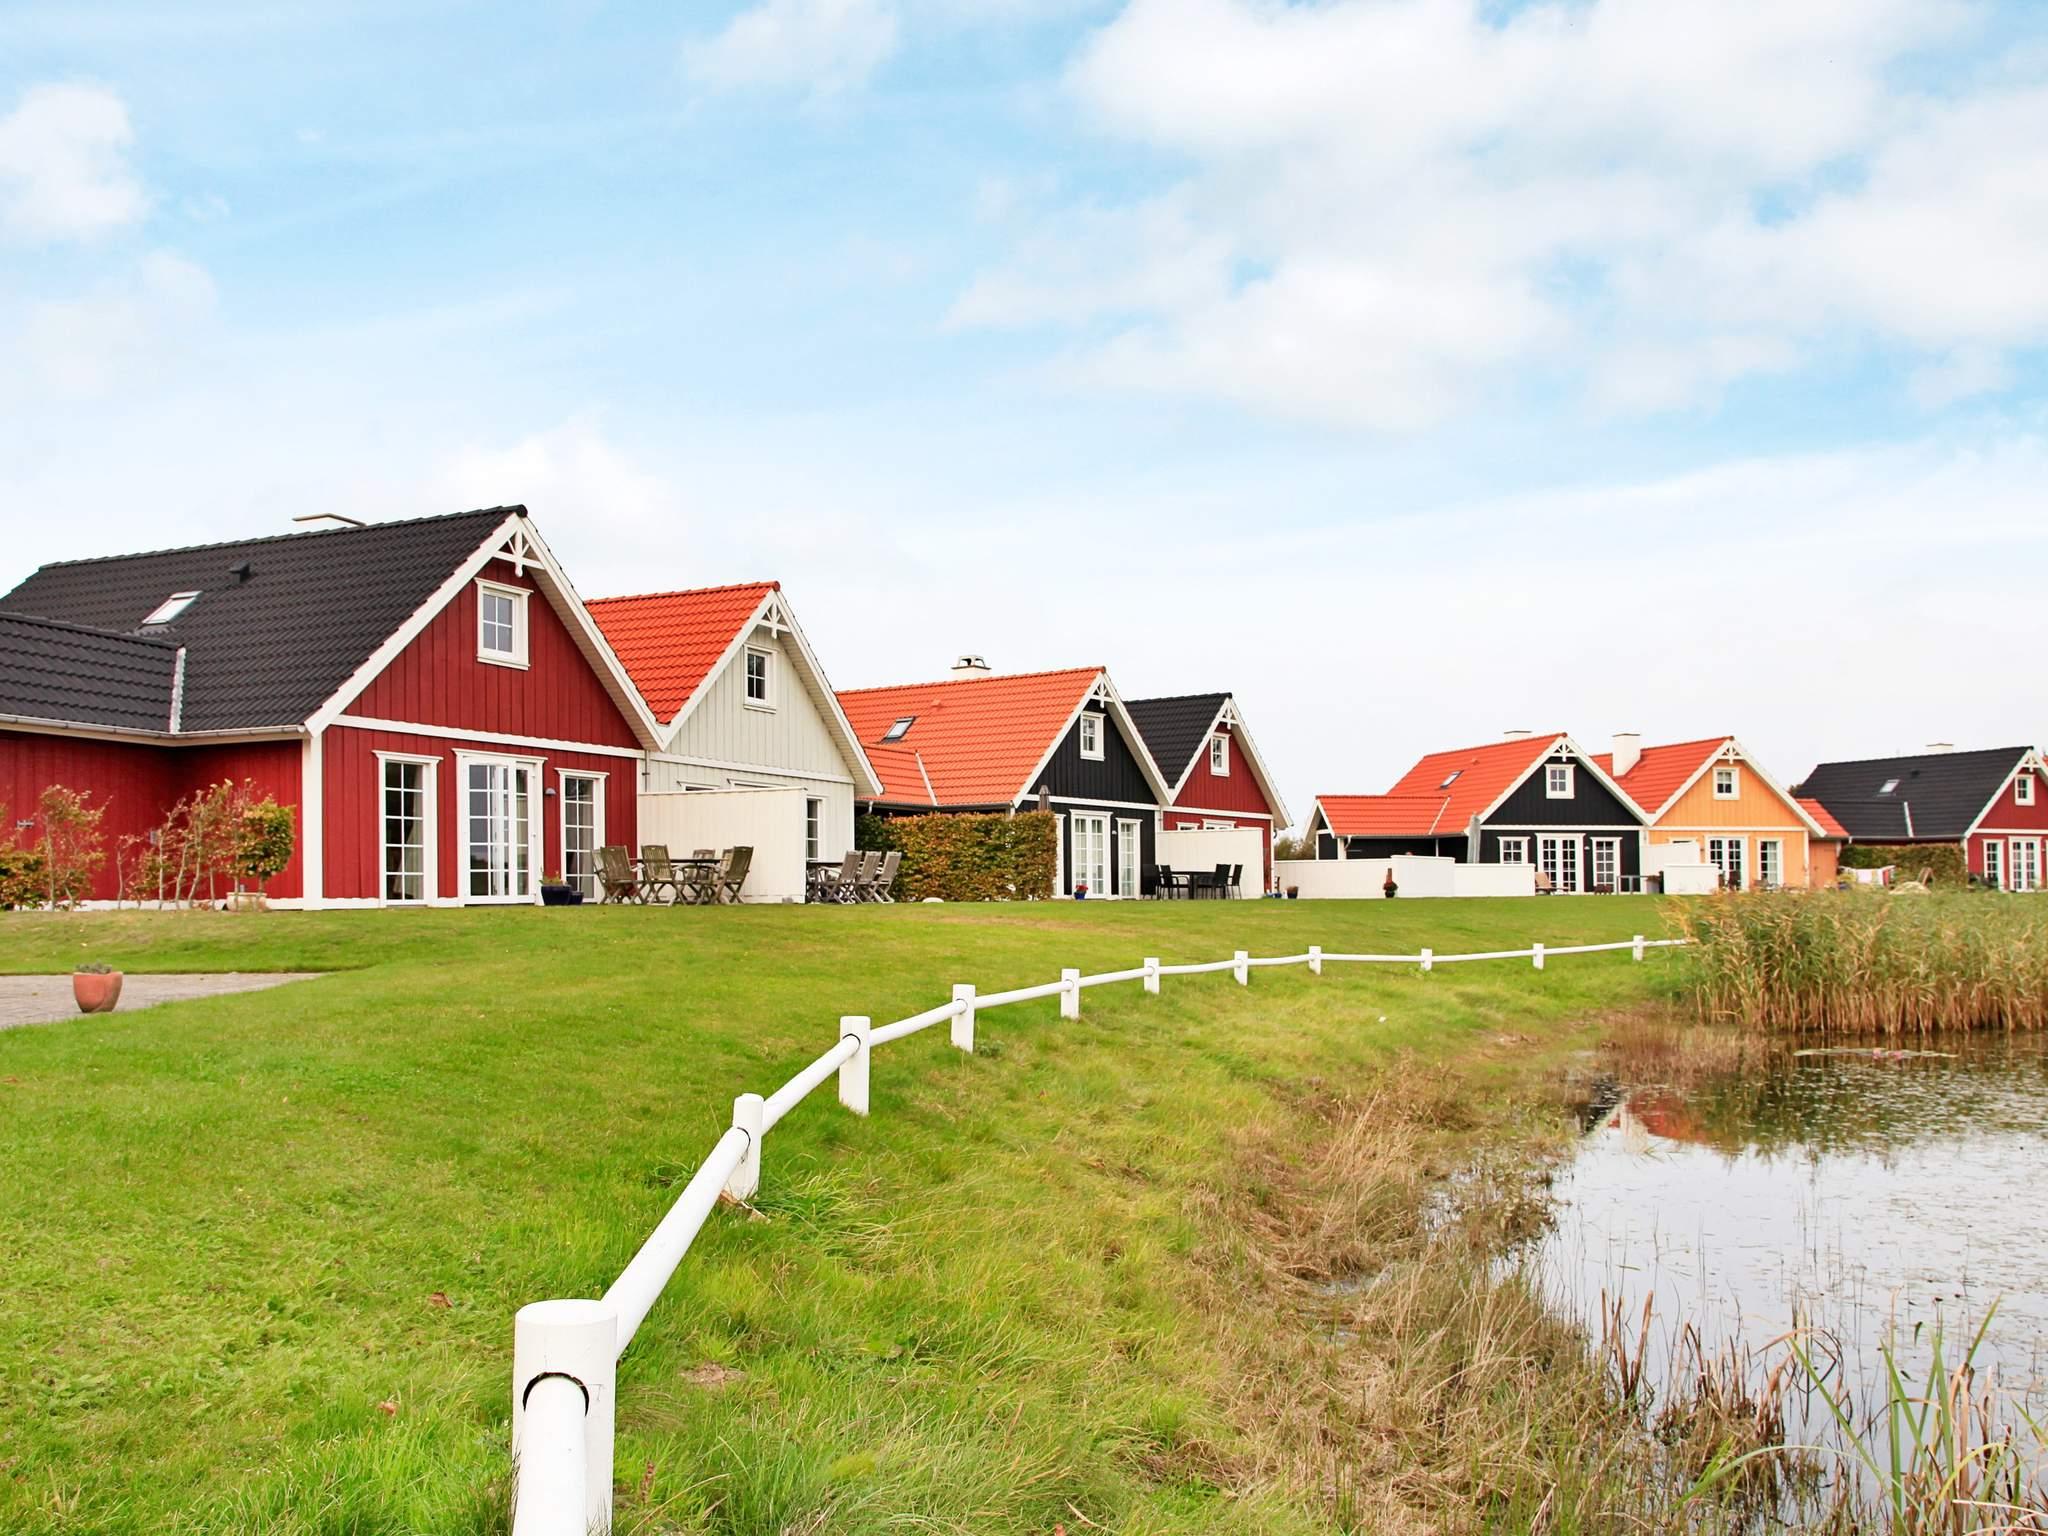 Ferienhaus Bro Strand (495161), Bro (DK), , Fünen, Dänemark, Bild 29